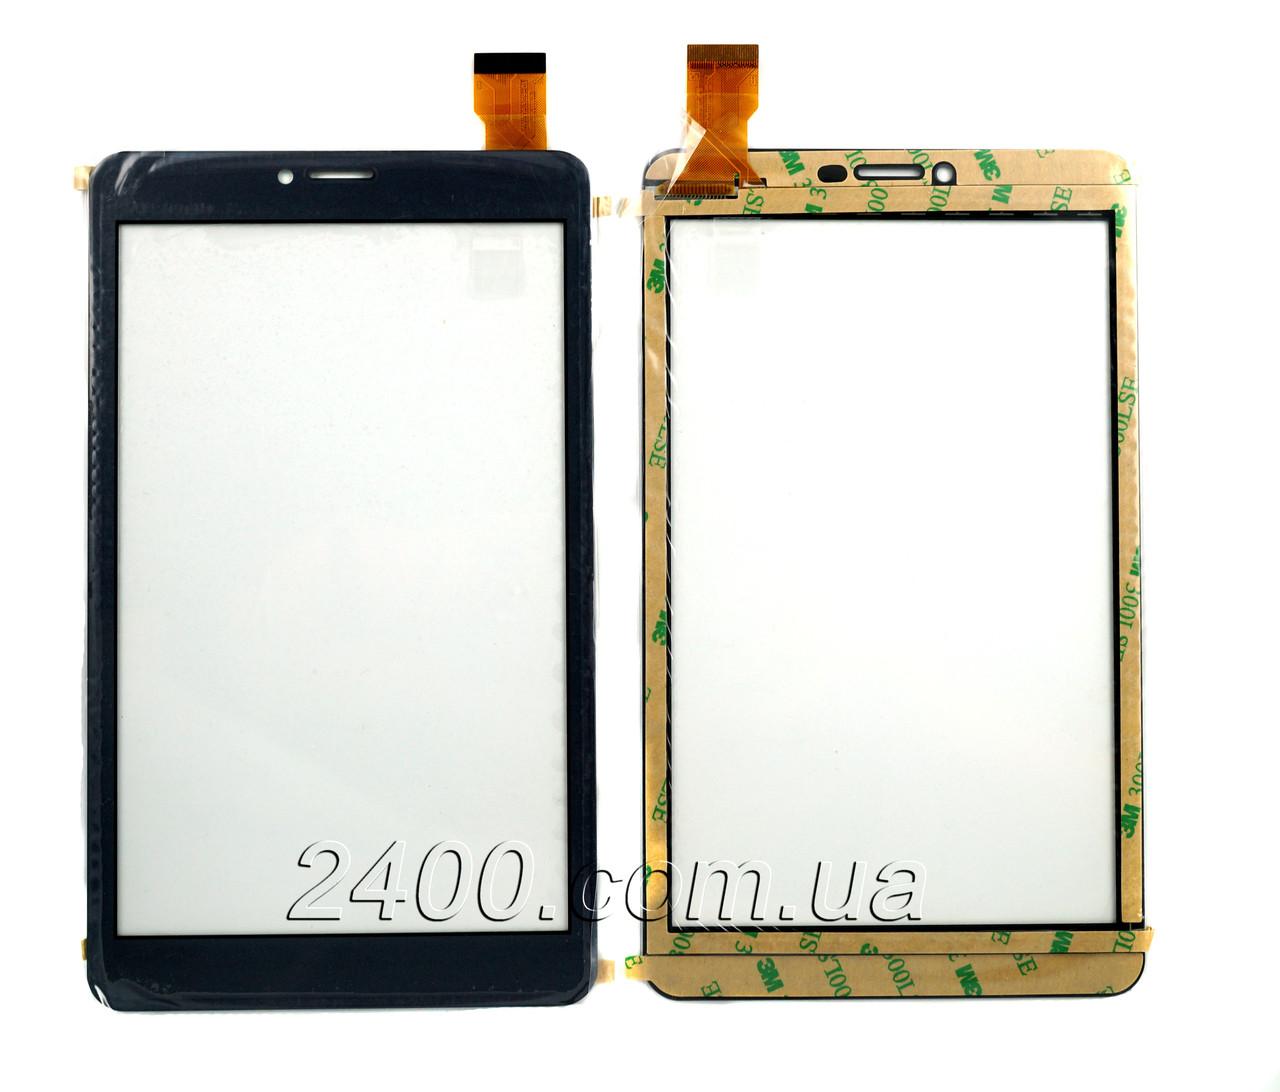 Сенсор, тачскрин планшета Nomi C070012 Corsa 3 + защитное стекло 2,5D (номи корса) серый, CY70S309-01